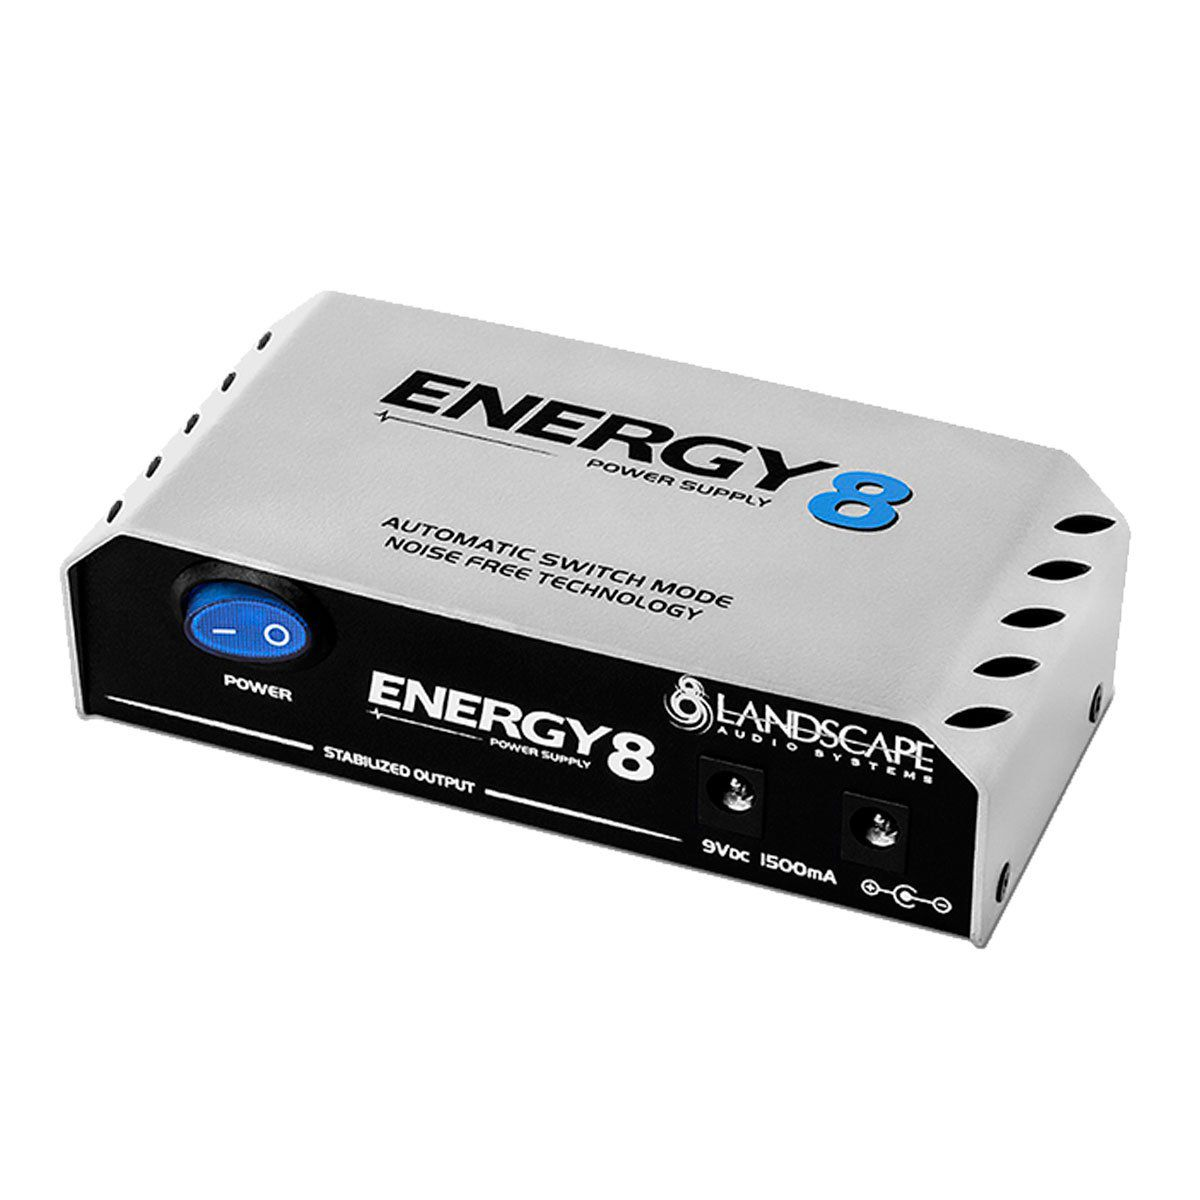 Fonte Automática de 9V DC 1500mA 8 Plugs - Energy 8 Landscape